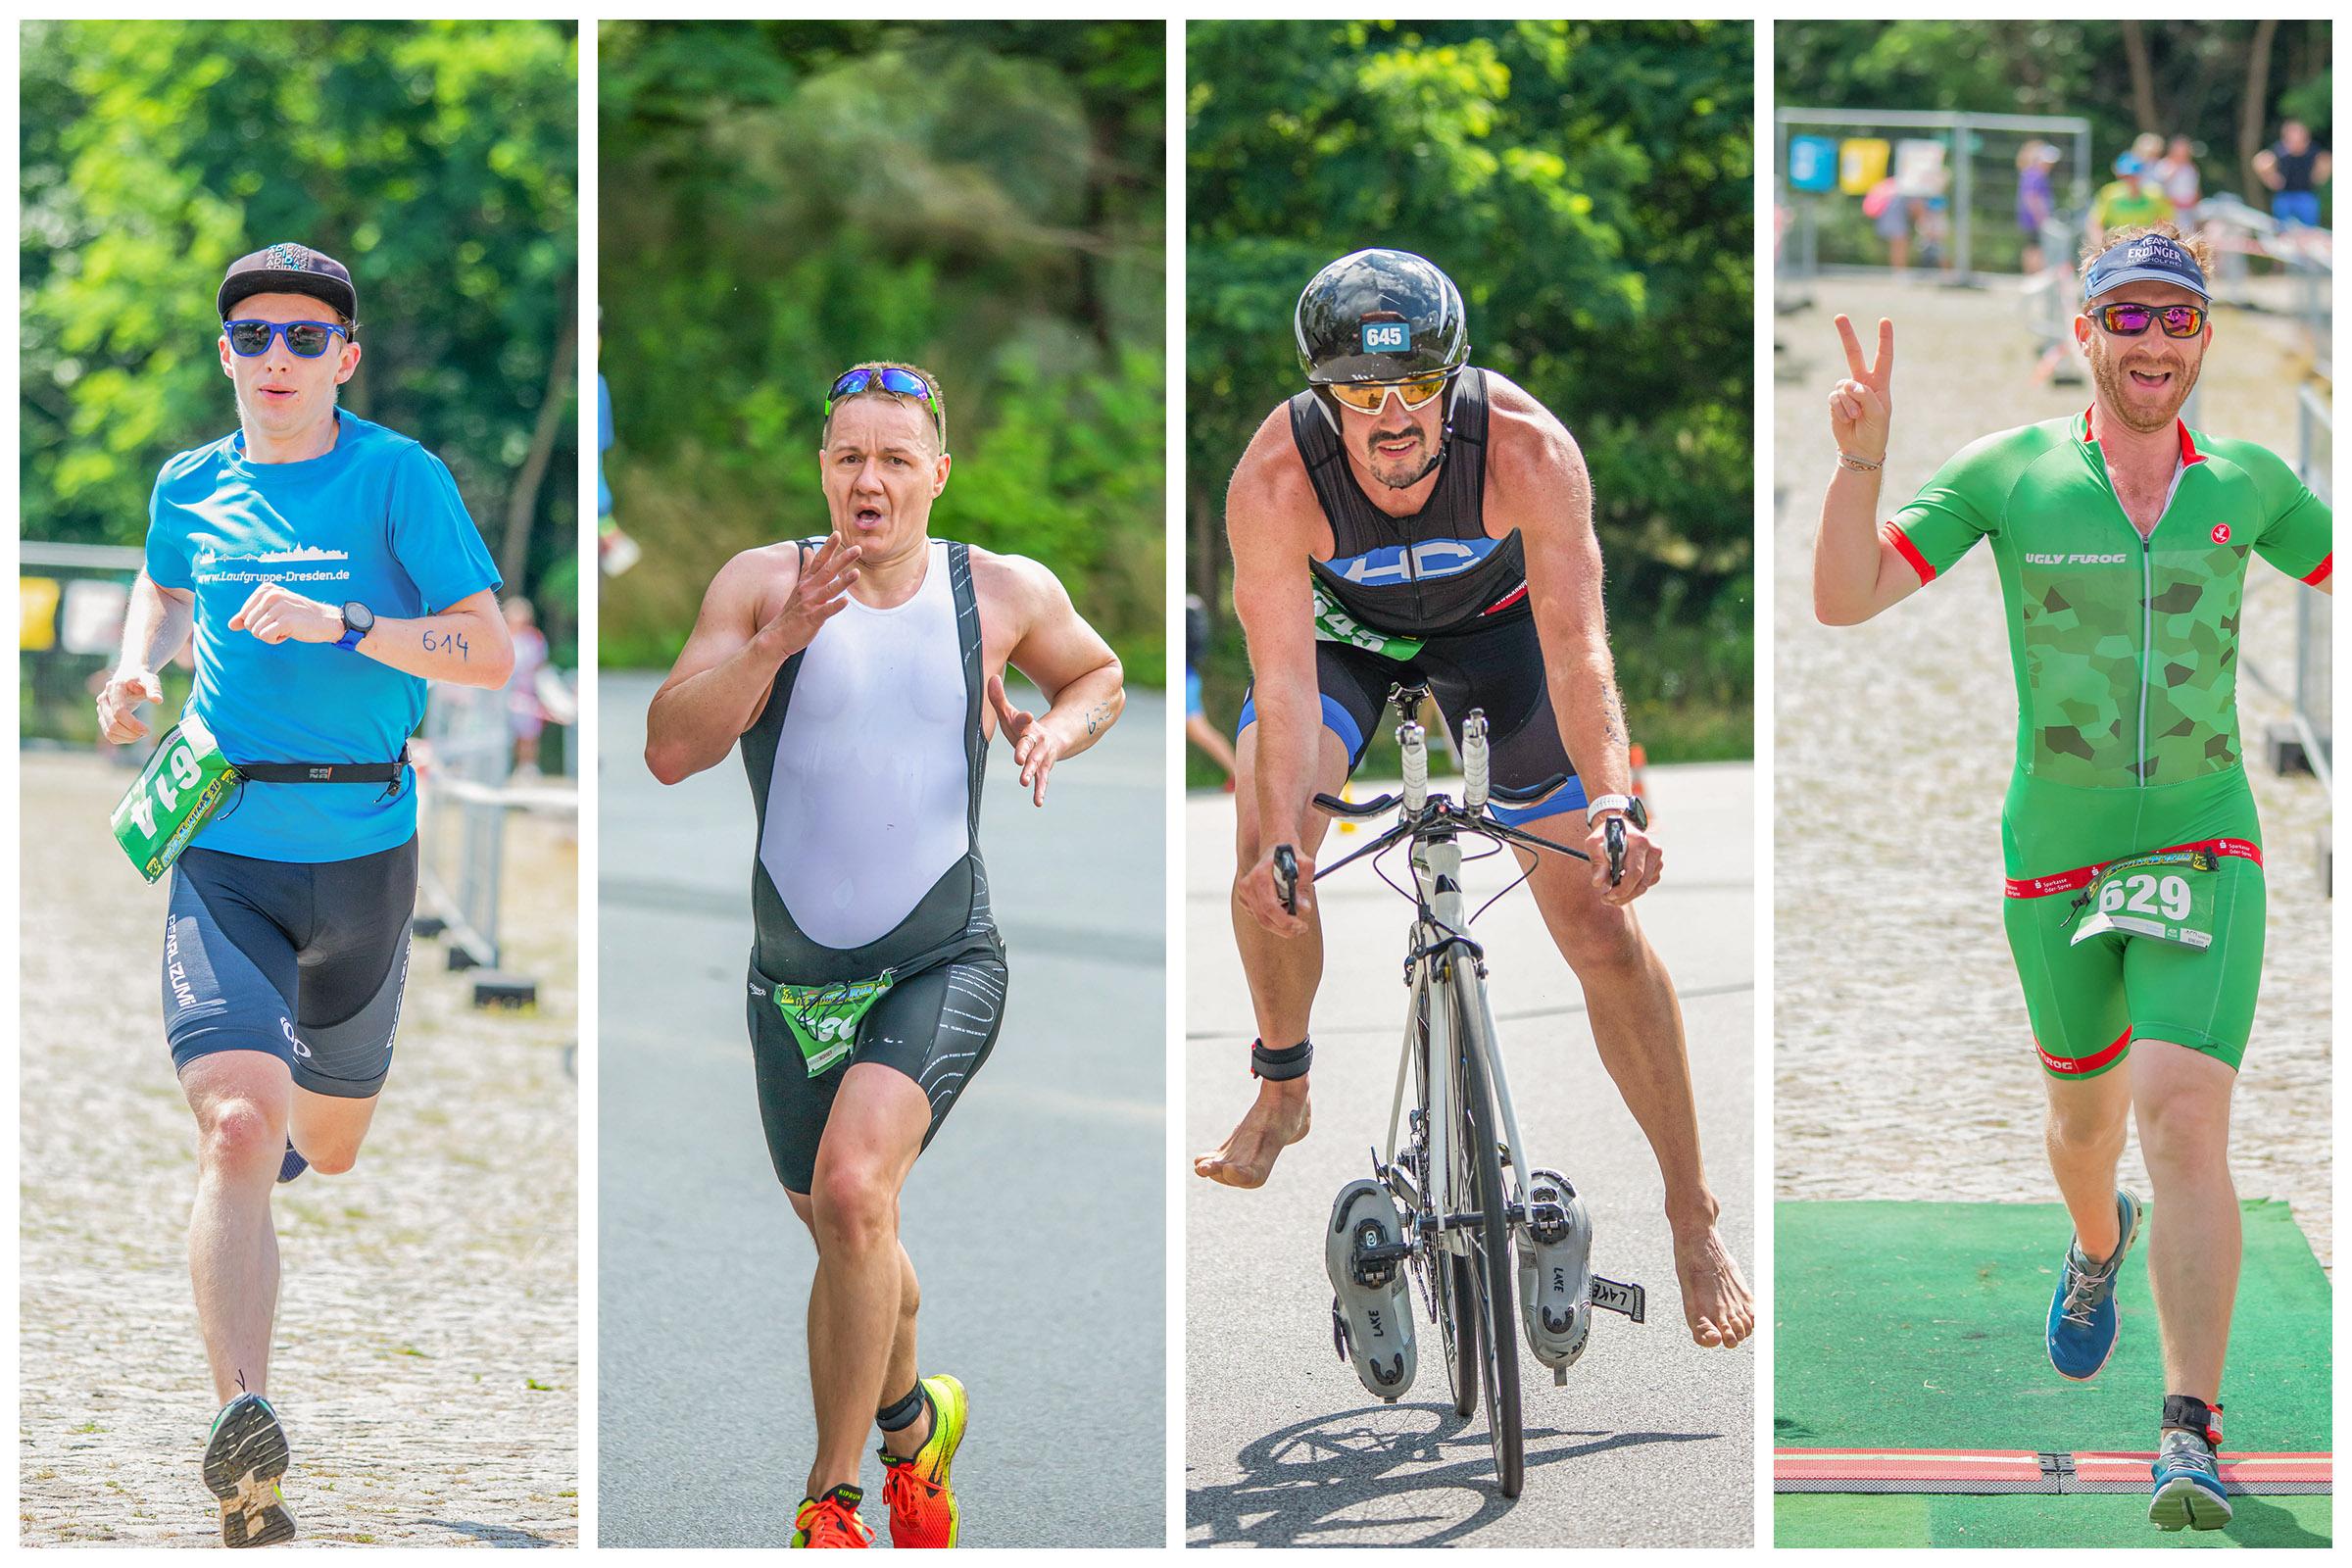 07.10.2021 Swim'N'Run & Triathlon Görlitz